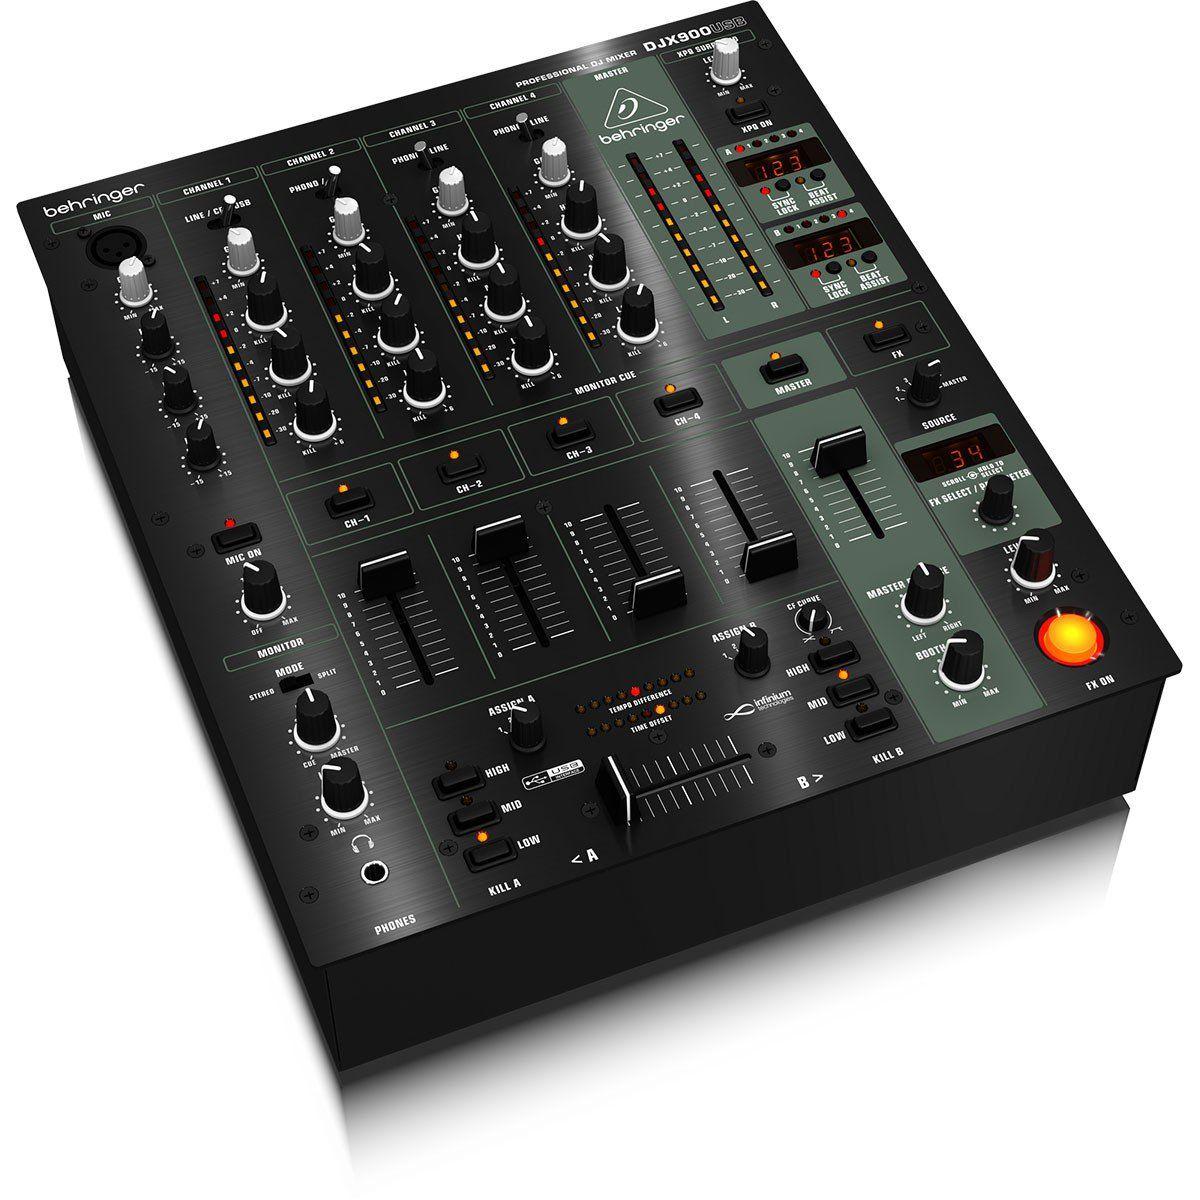 Behringer DJX900 Mixer Behringer DJX900 Usb com 5 Canais e Crossfader